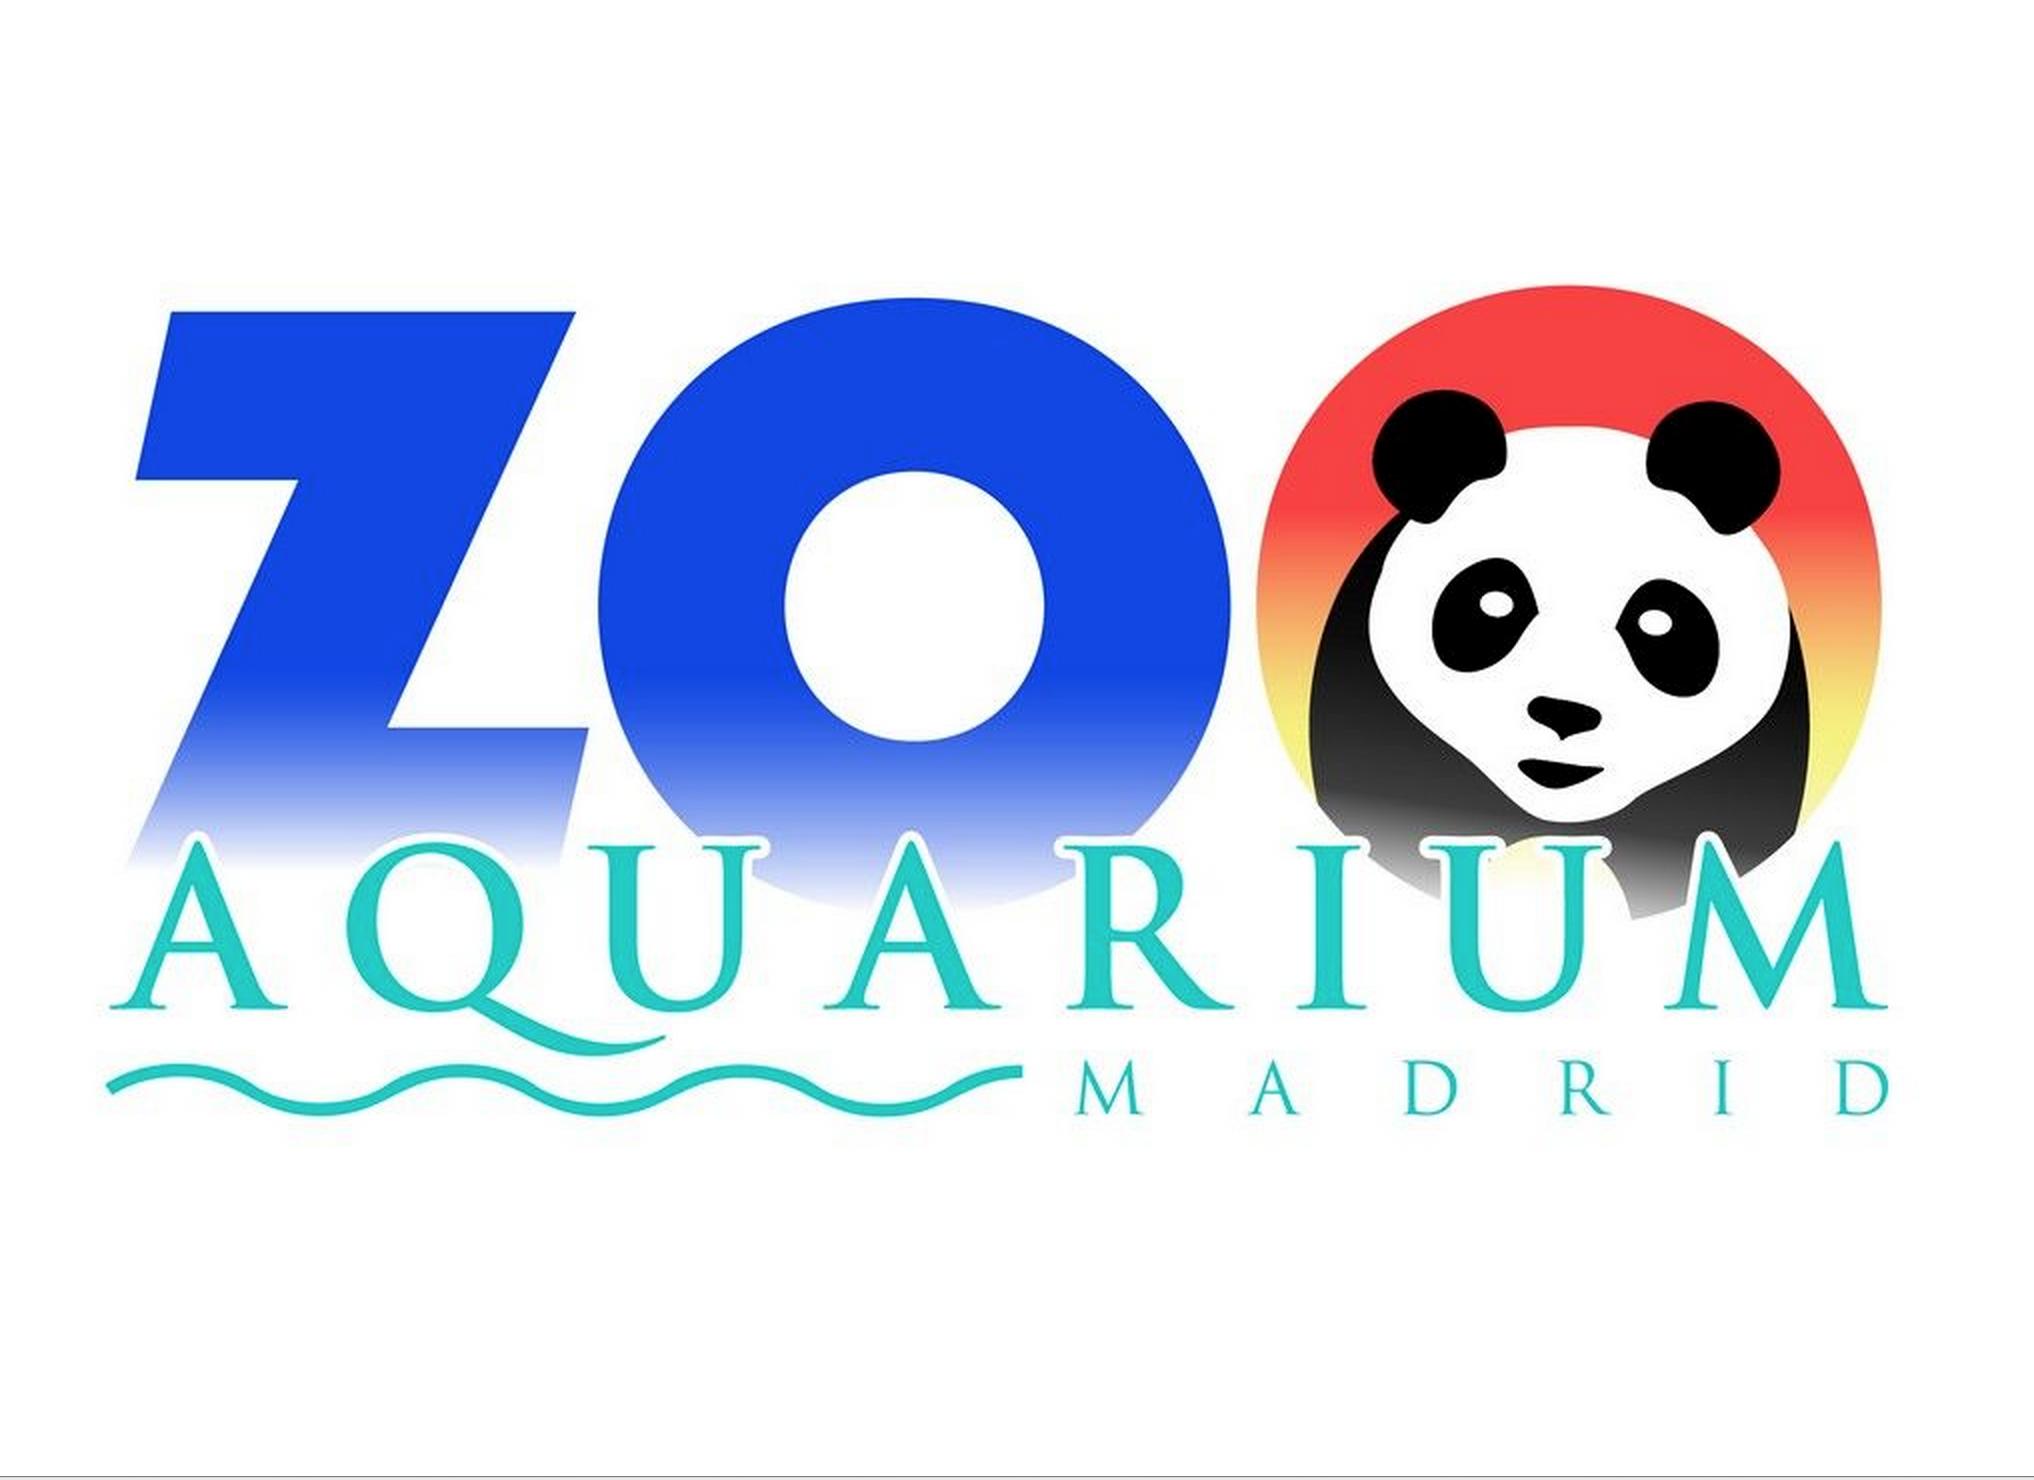 Zoo aquarium de for Precio entrada aquarium